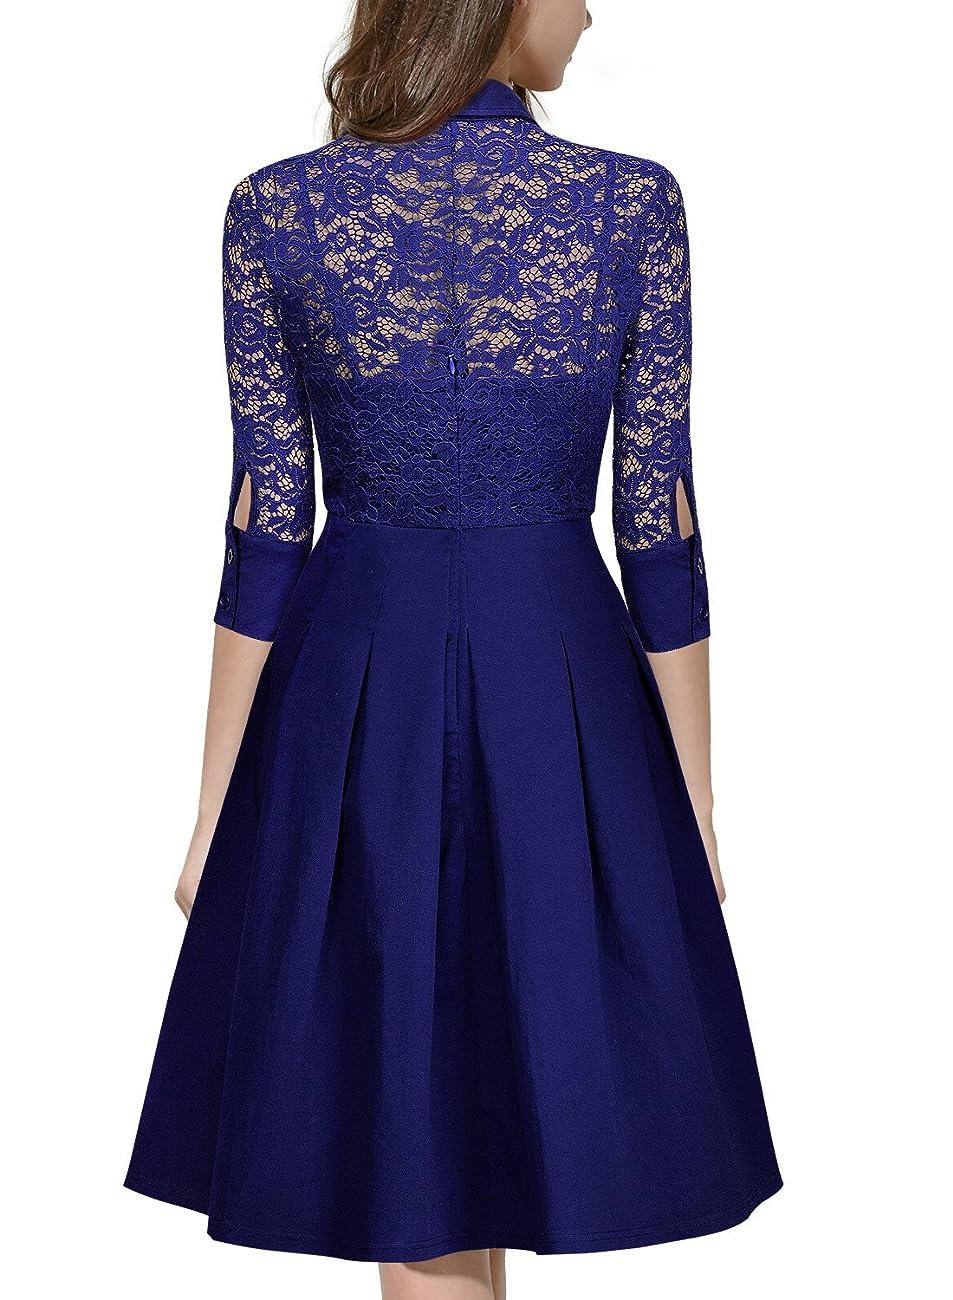 Missmay Women's Vintage 1950s Style 3/4 Sleeve Black Lace Flare A-line Dress 1